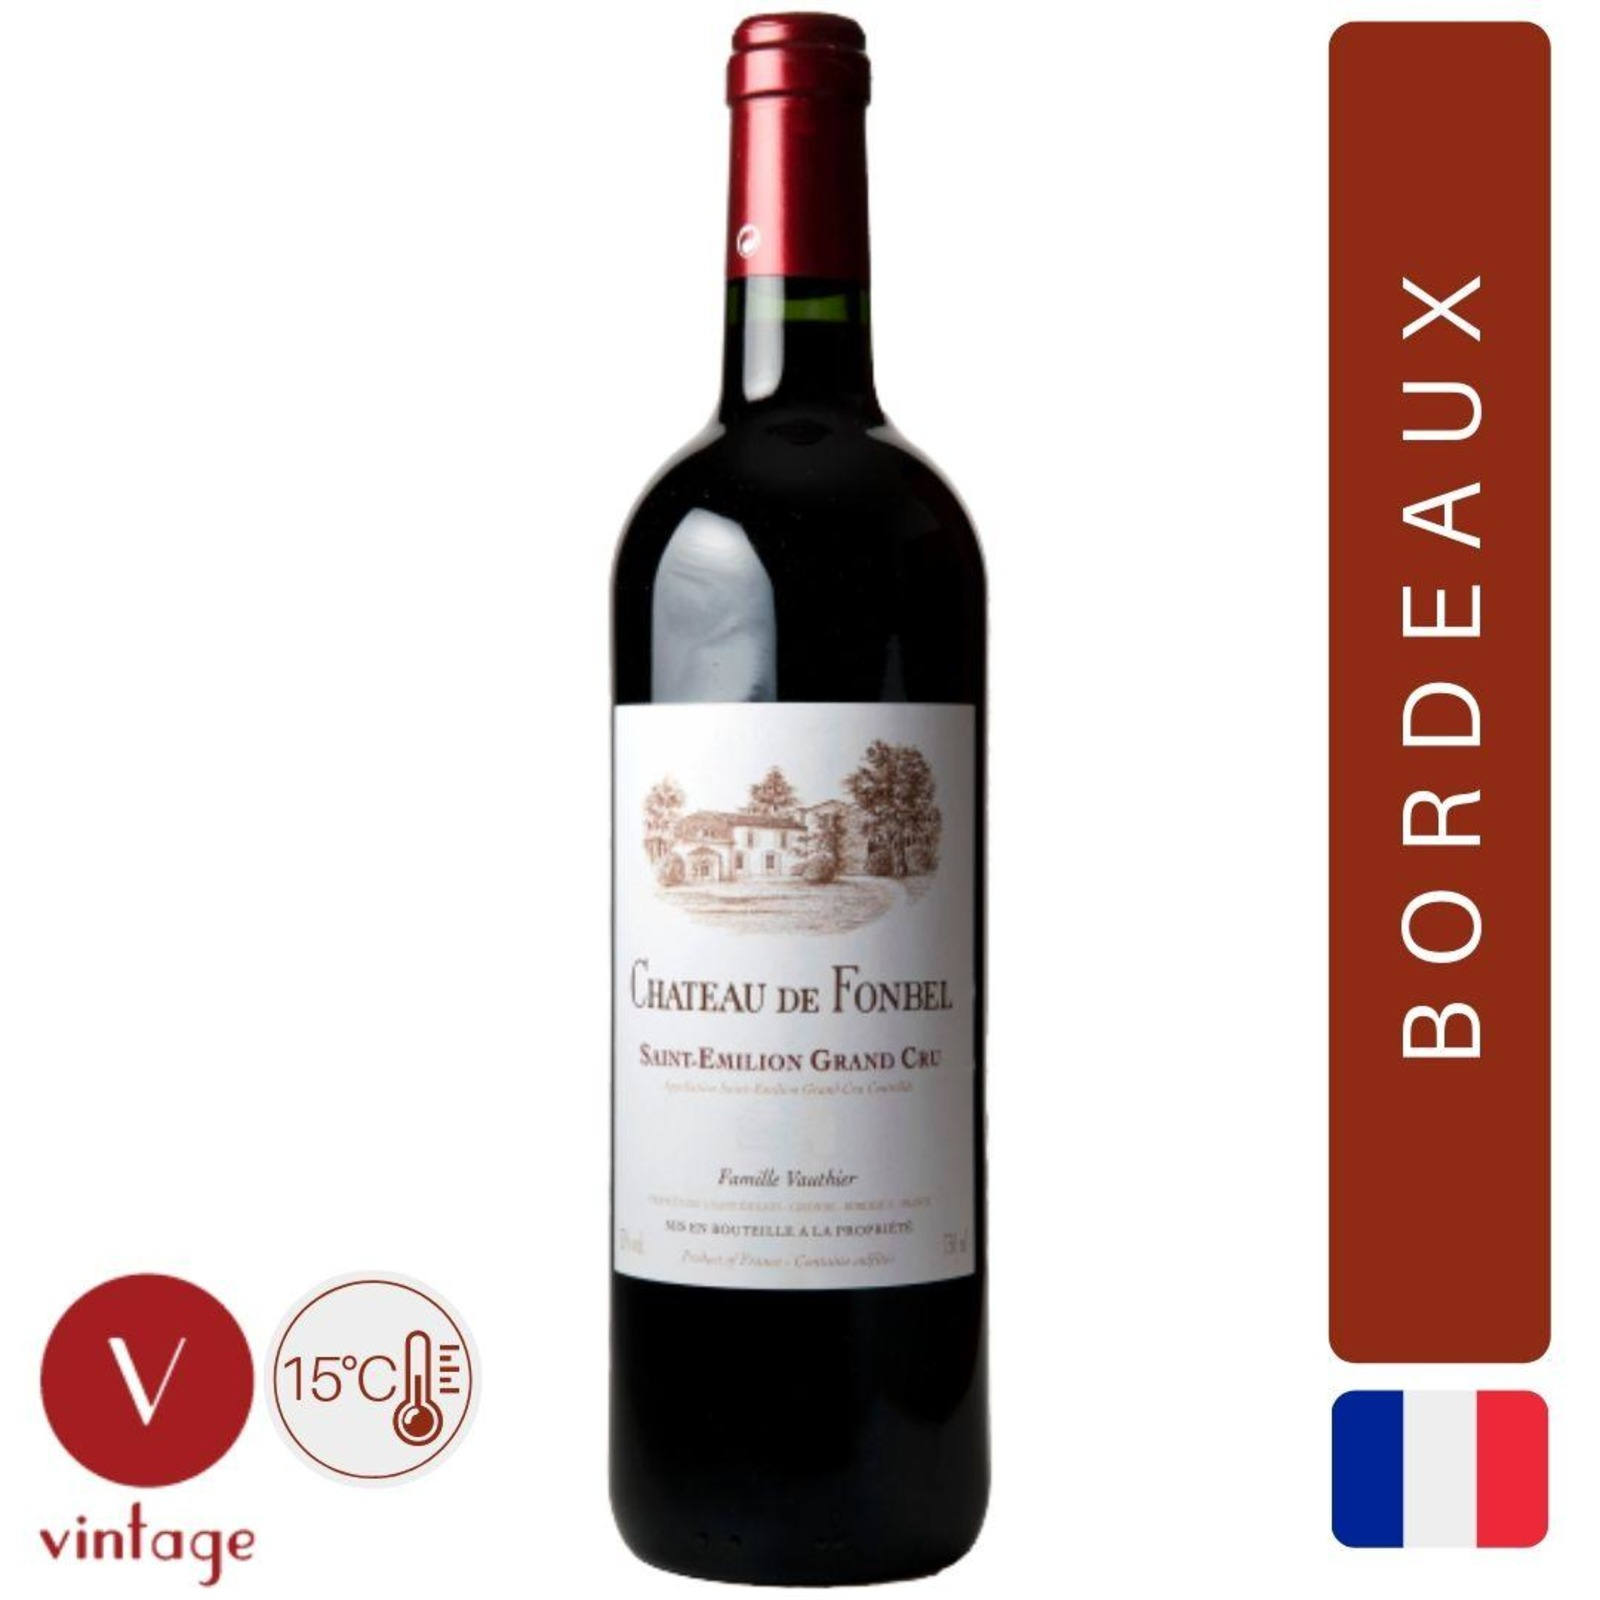 Chateau Fonbel - Saint Emilion Grand Cru - Bordeaux Red Wine